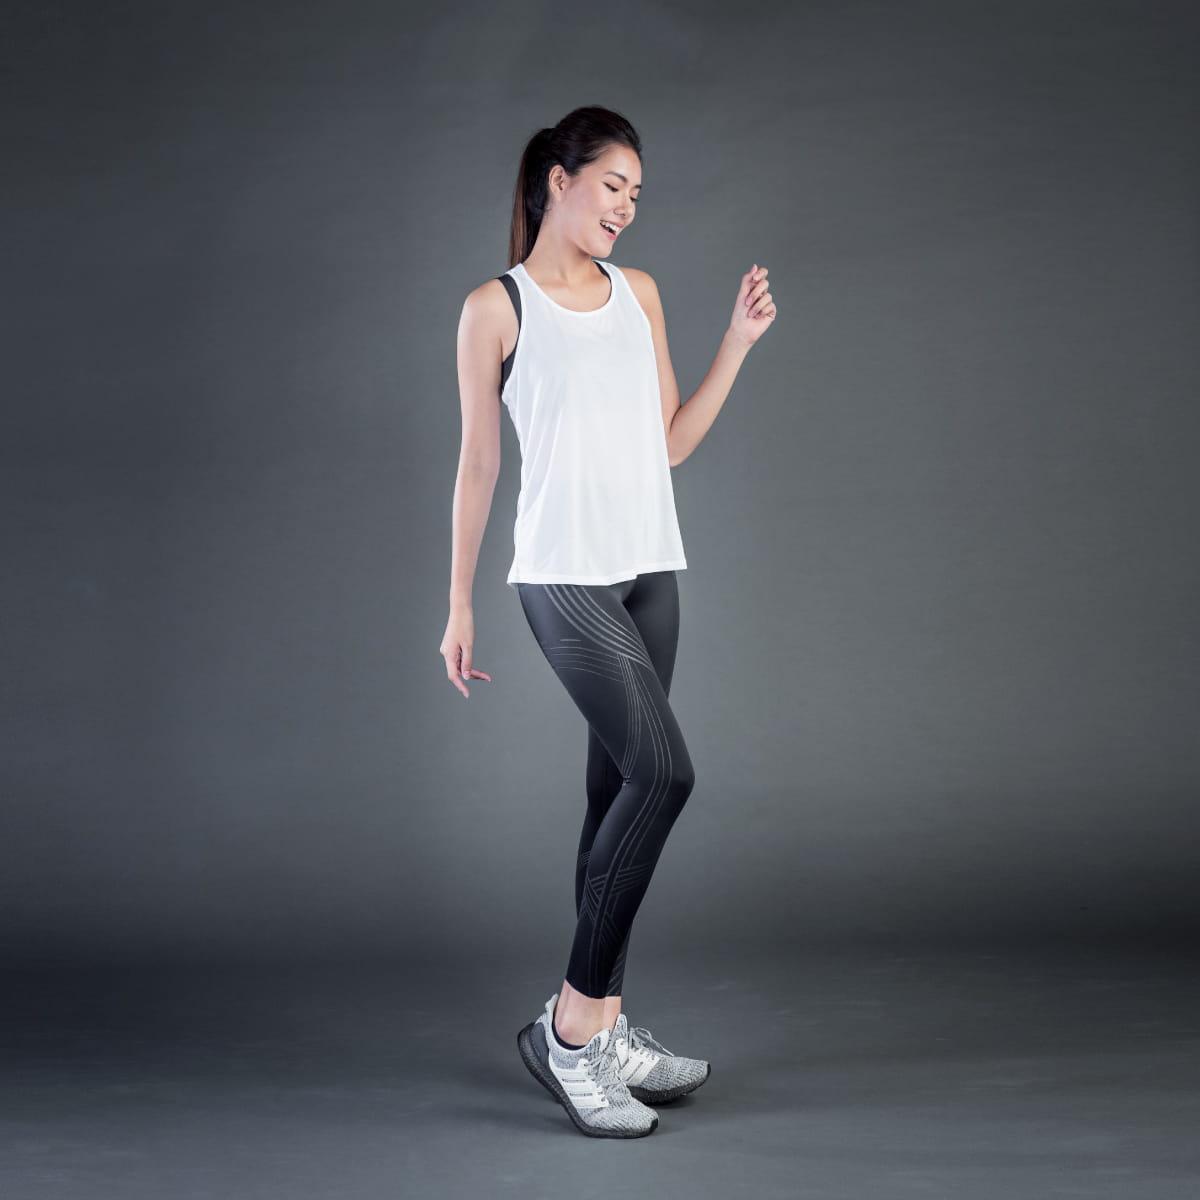 TENO超彈感美型健身褲-Track軌跡 16